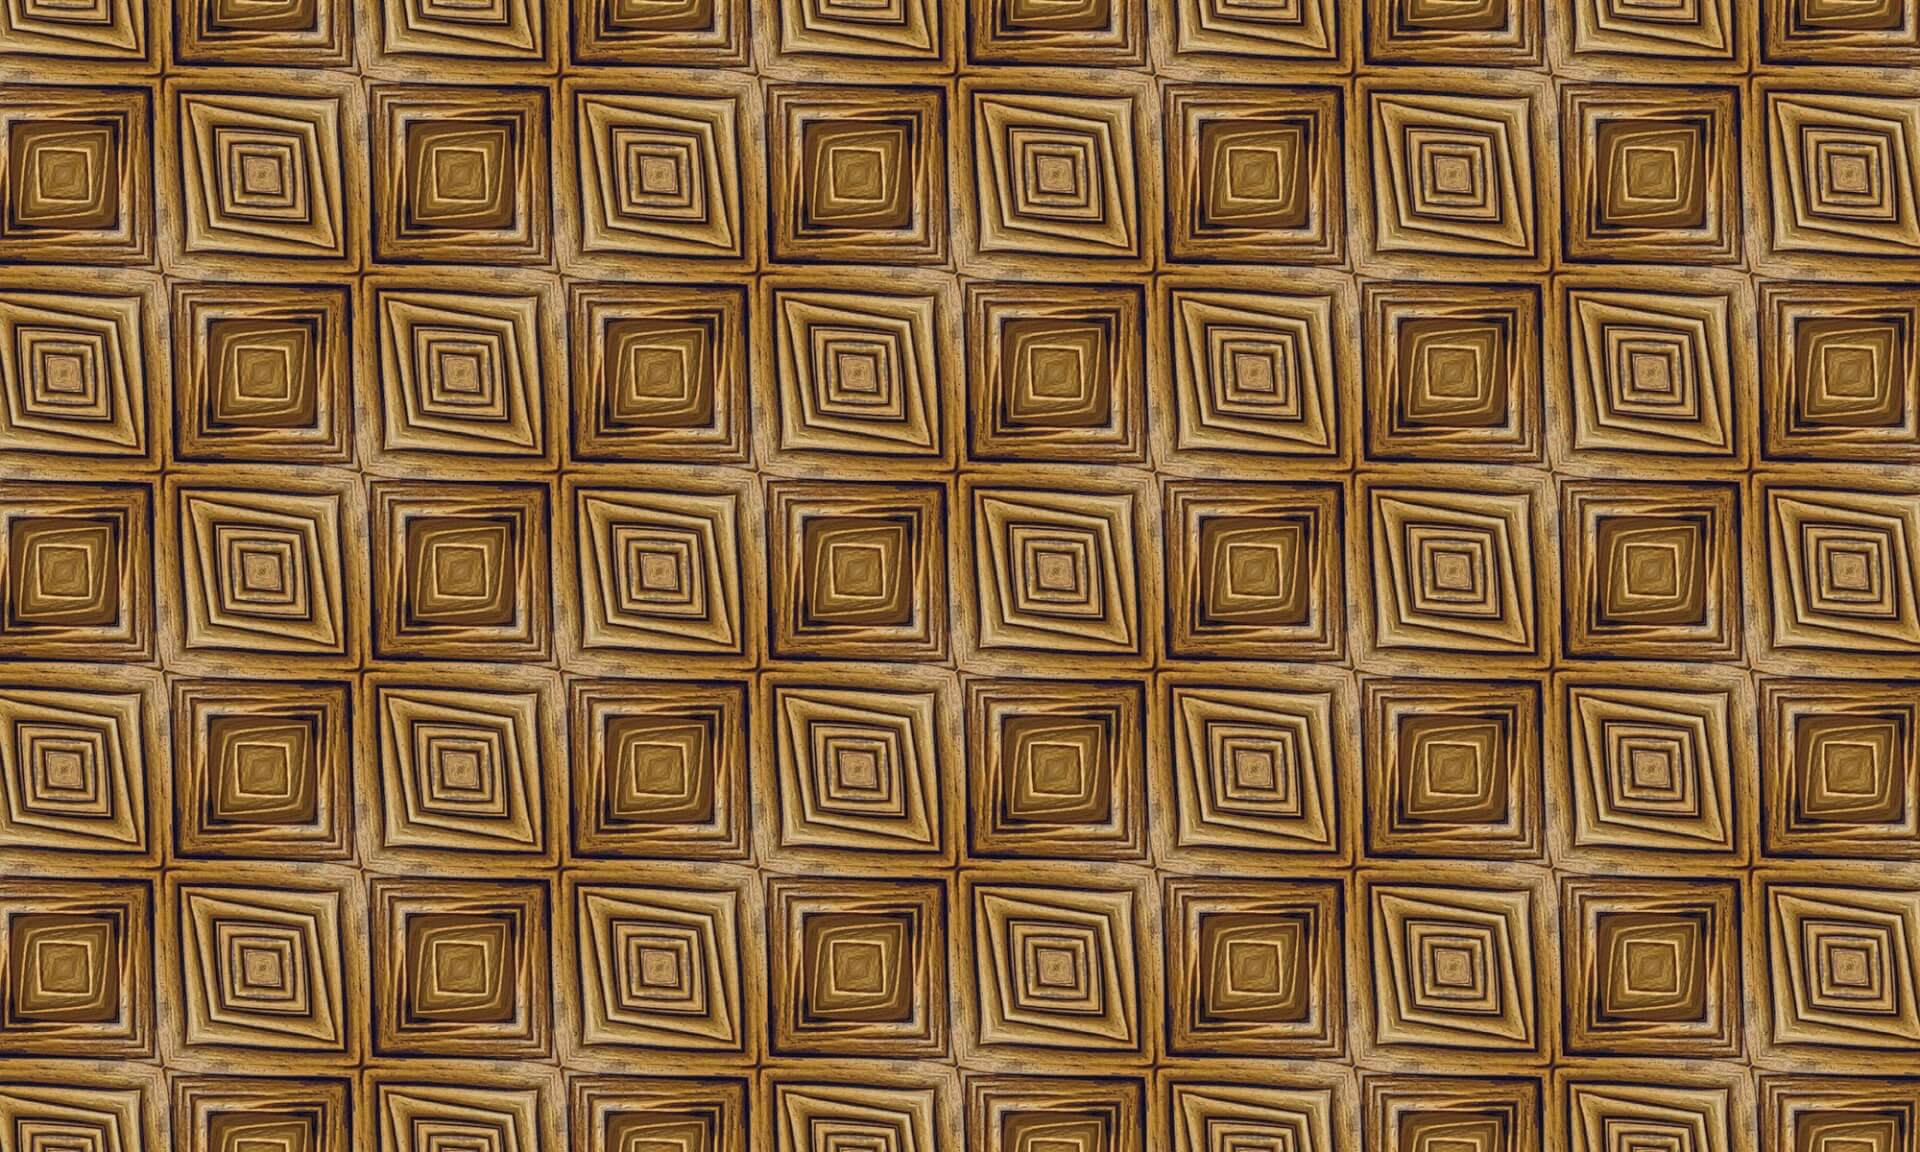 Wacky Wood Paneling (DE0594)-Square Doug Garrabrants